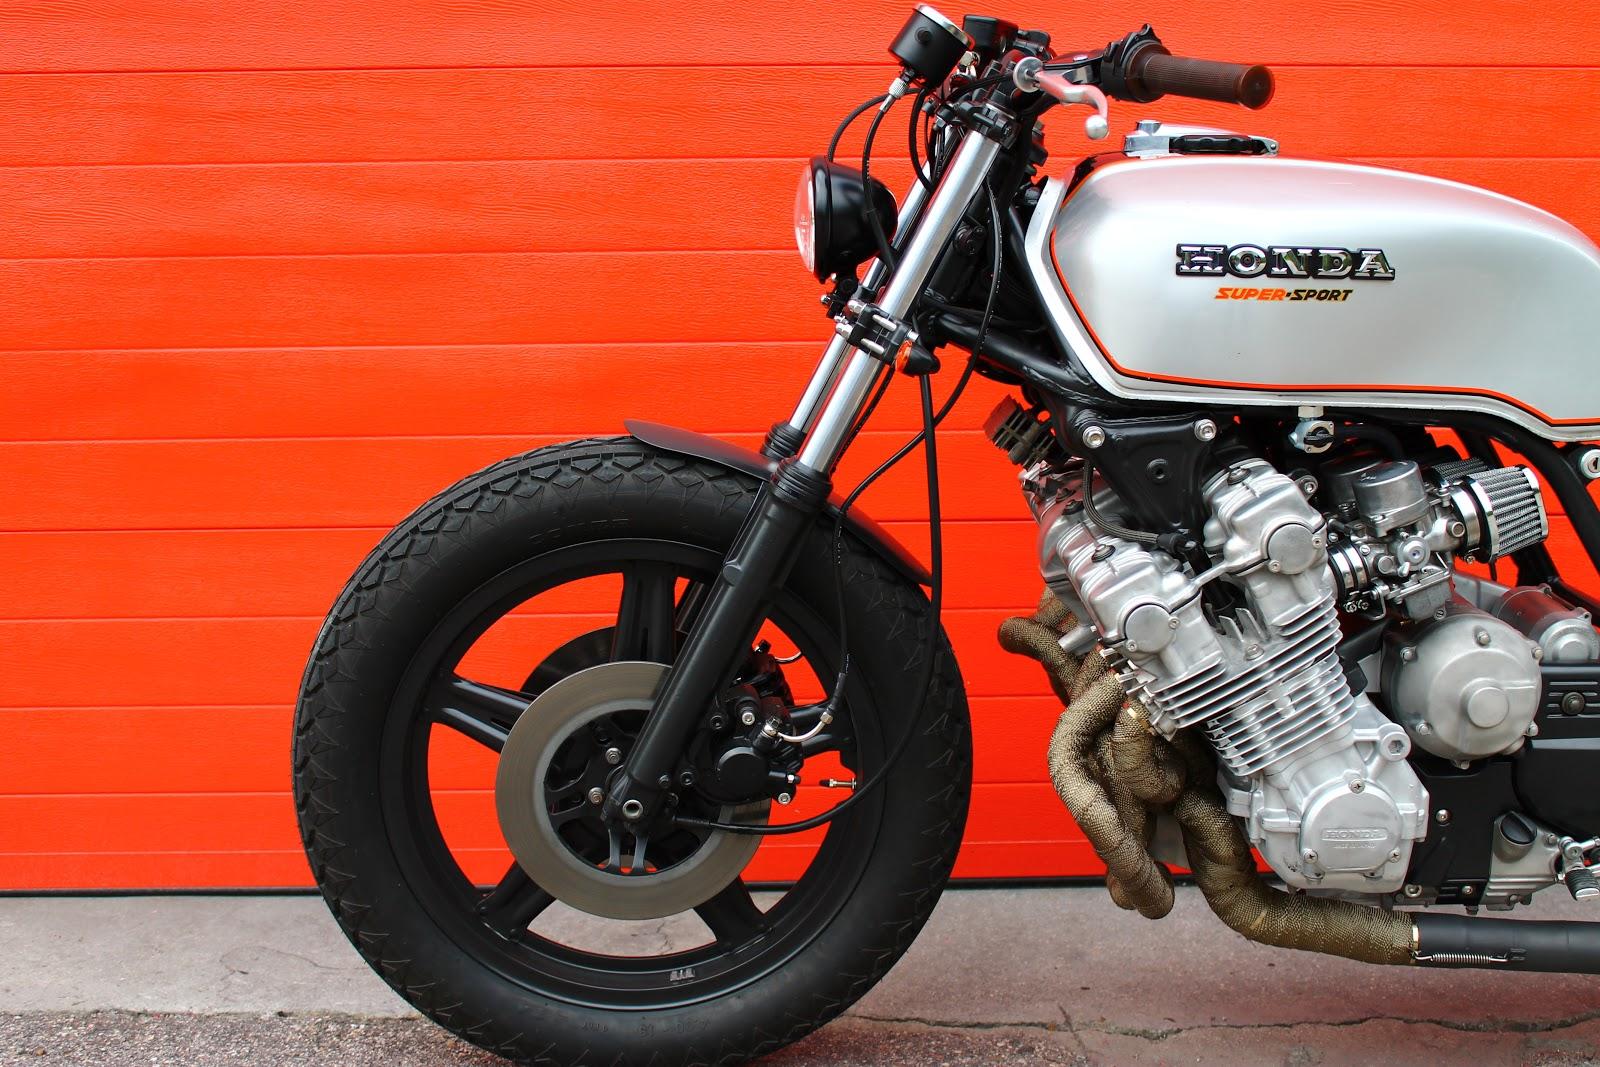 custom motorcycles cbx1000 honda tarmac cylinder cbx brat six cafe racer tc bratstyle autoevolution bike cc customs